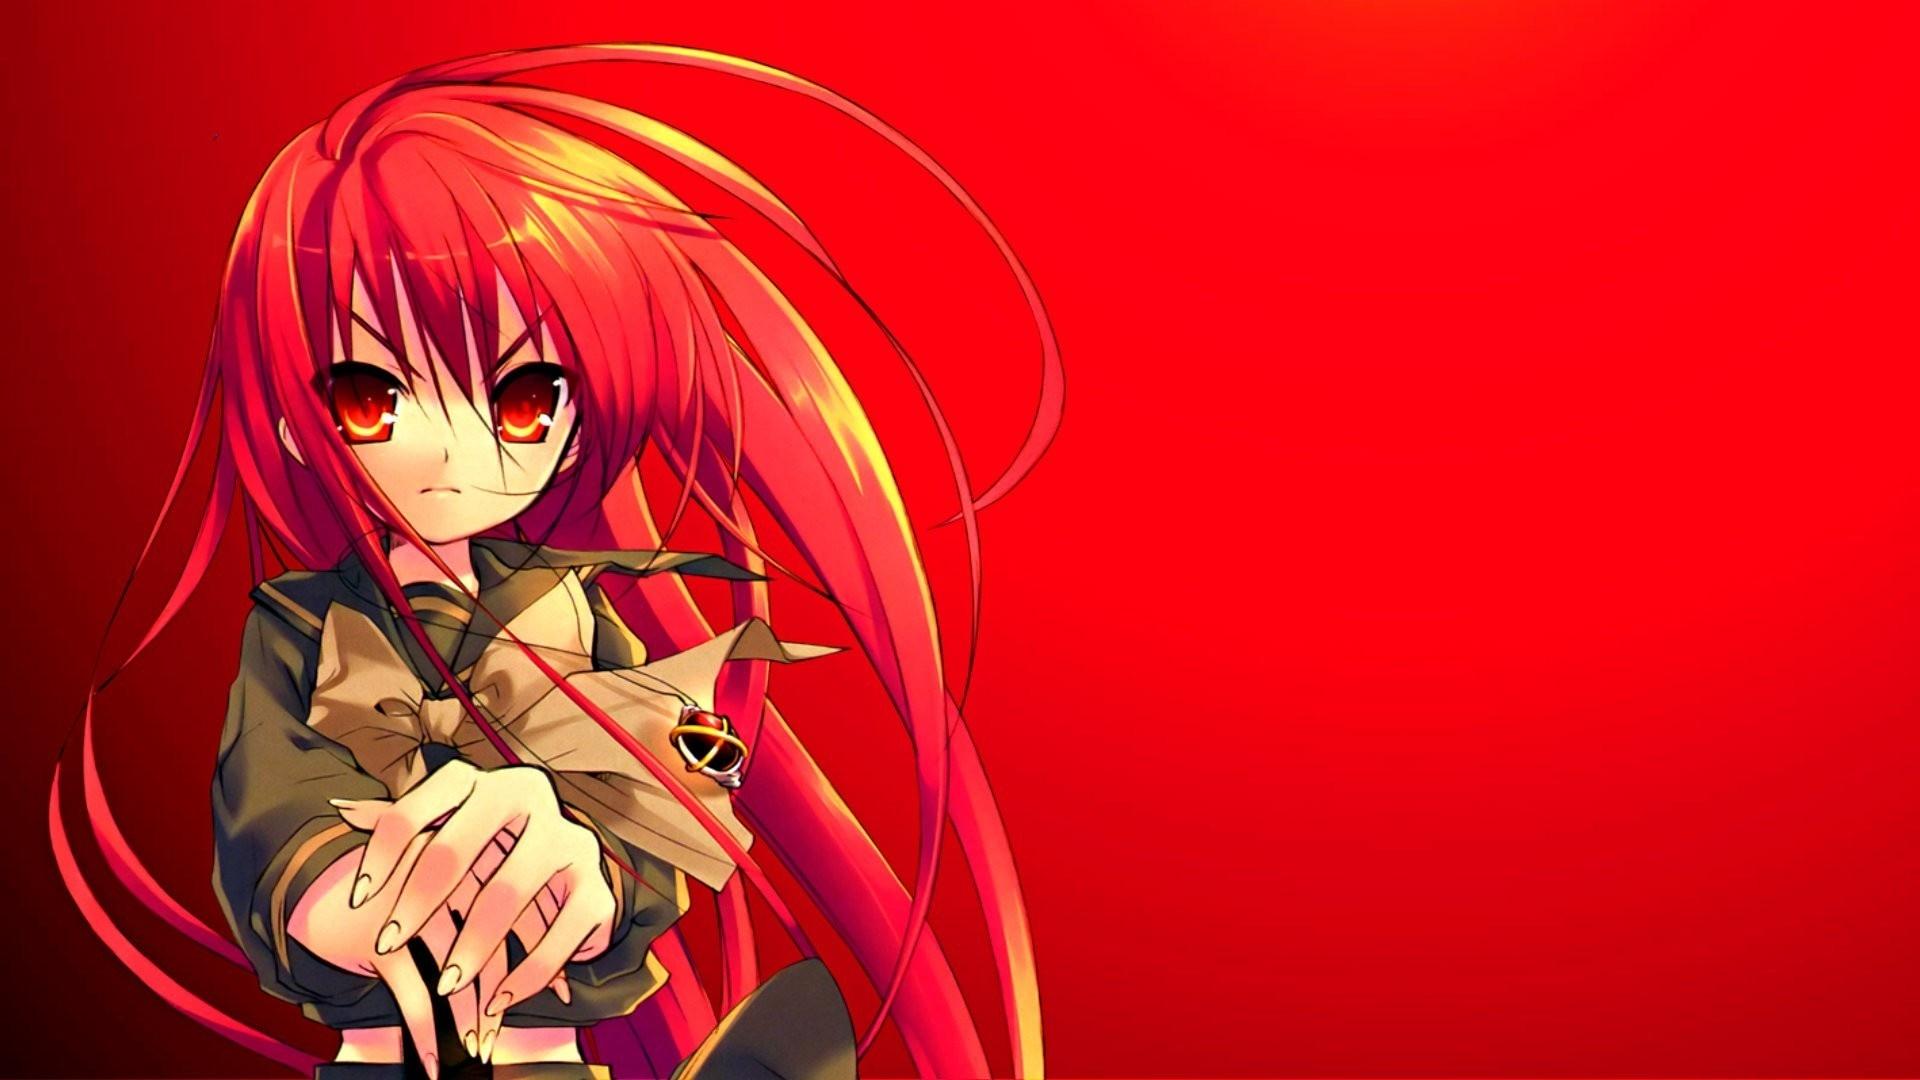 Red Anime Girl Wallpaper theme